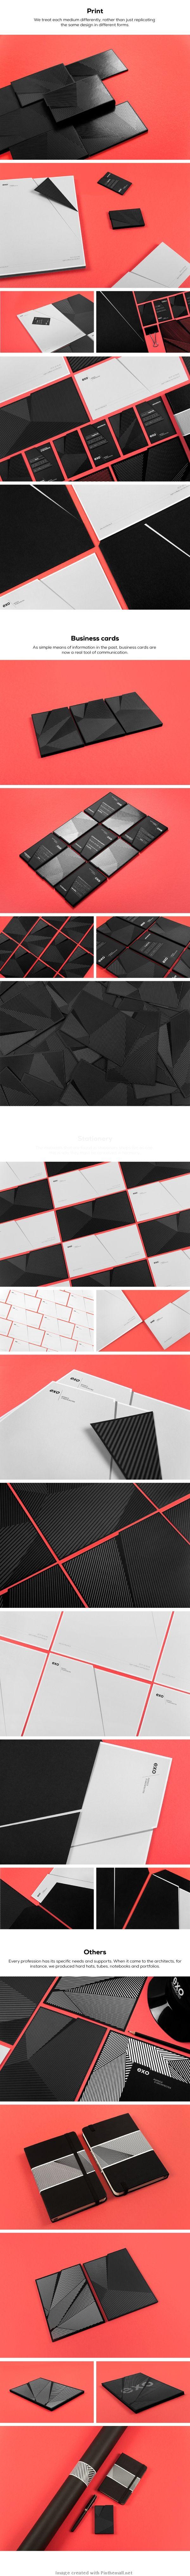 EXO | #stationary #corporate #design #corporatedesign #identity #branding #marketing < repinned by www.BlickeDeeler.de | Visit our website: www.blickedeeler.de/leistungen/corporate-design